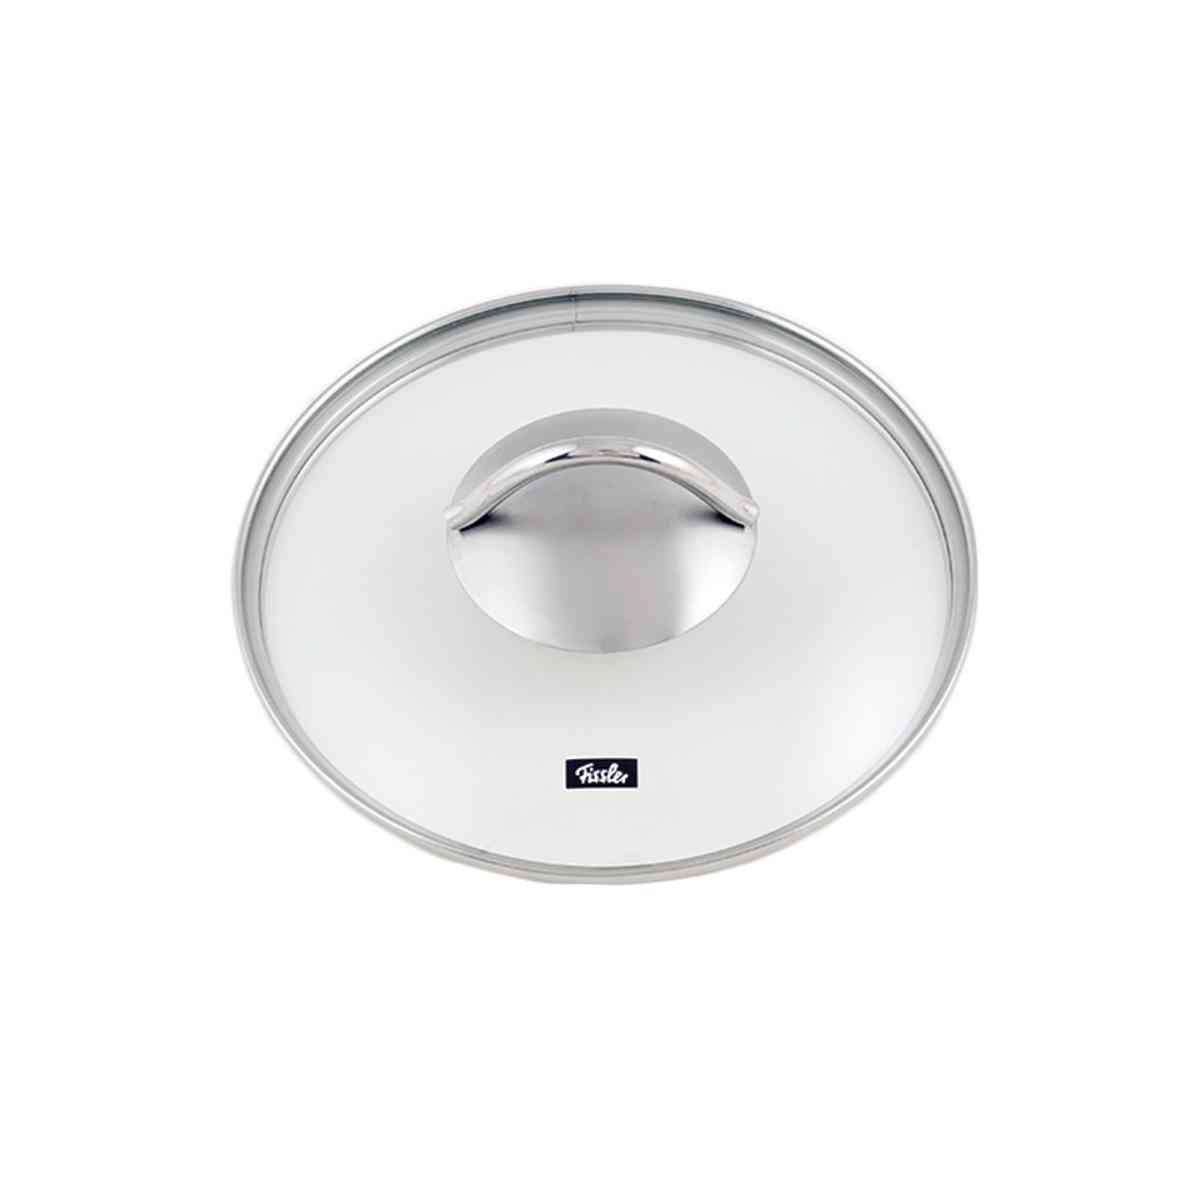 london / vienna glass lid 16 cm